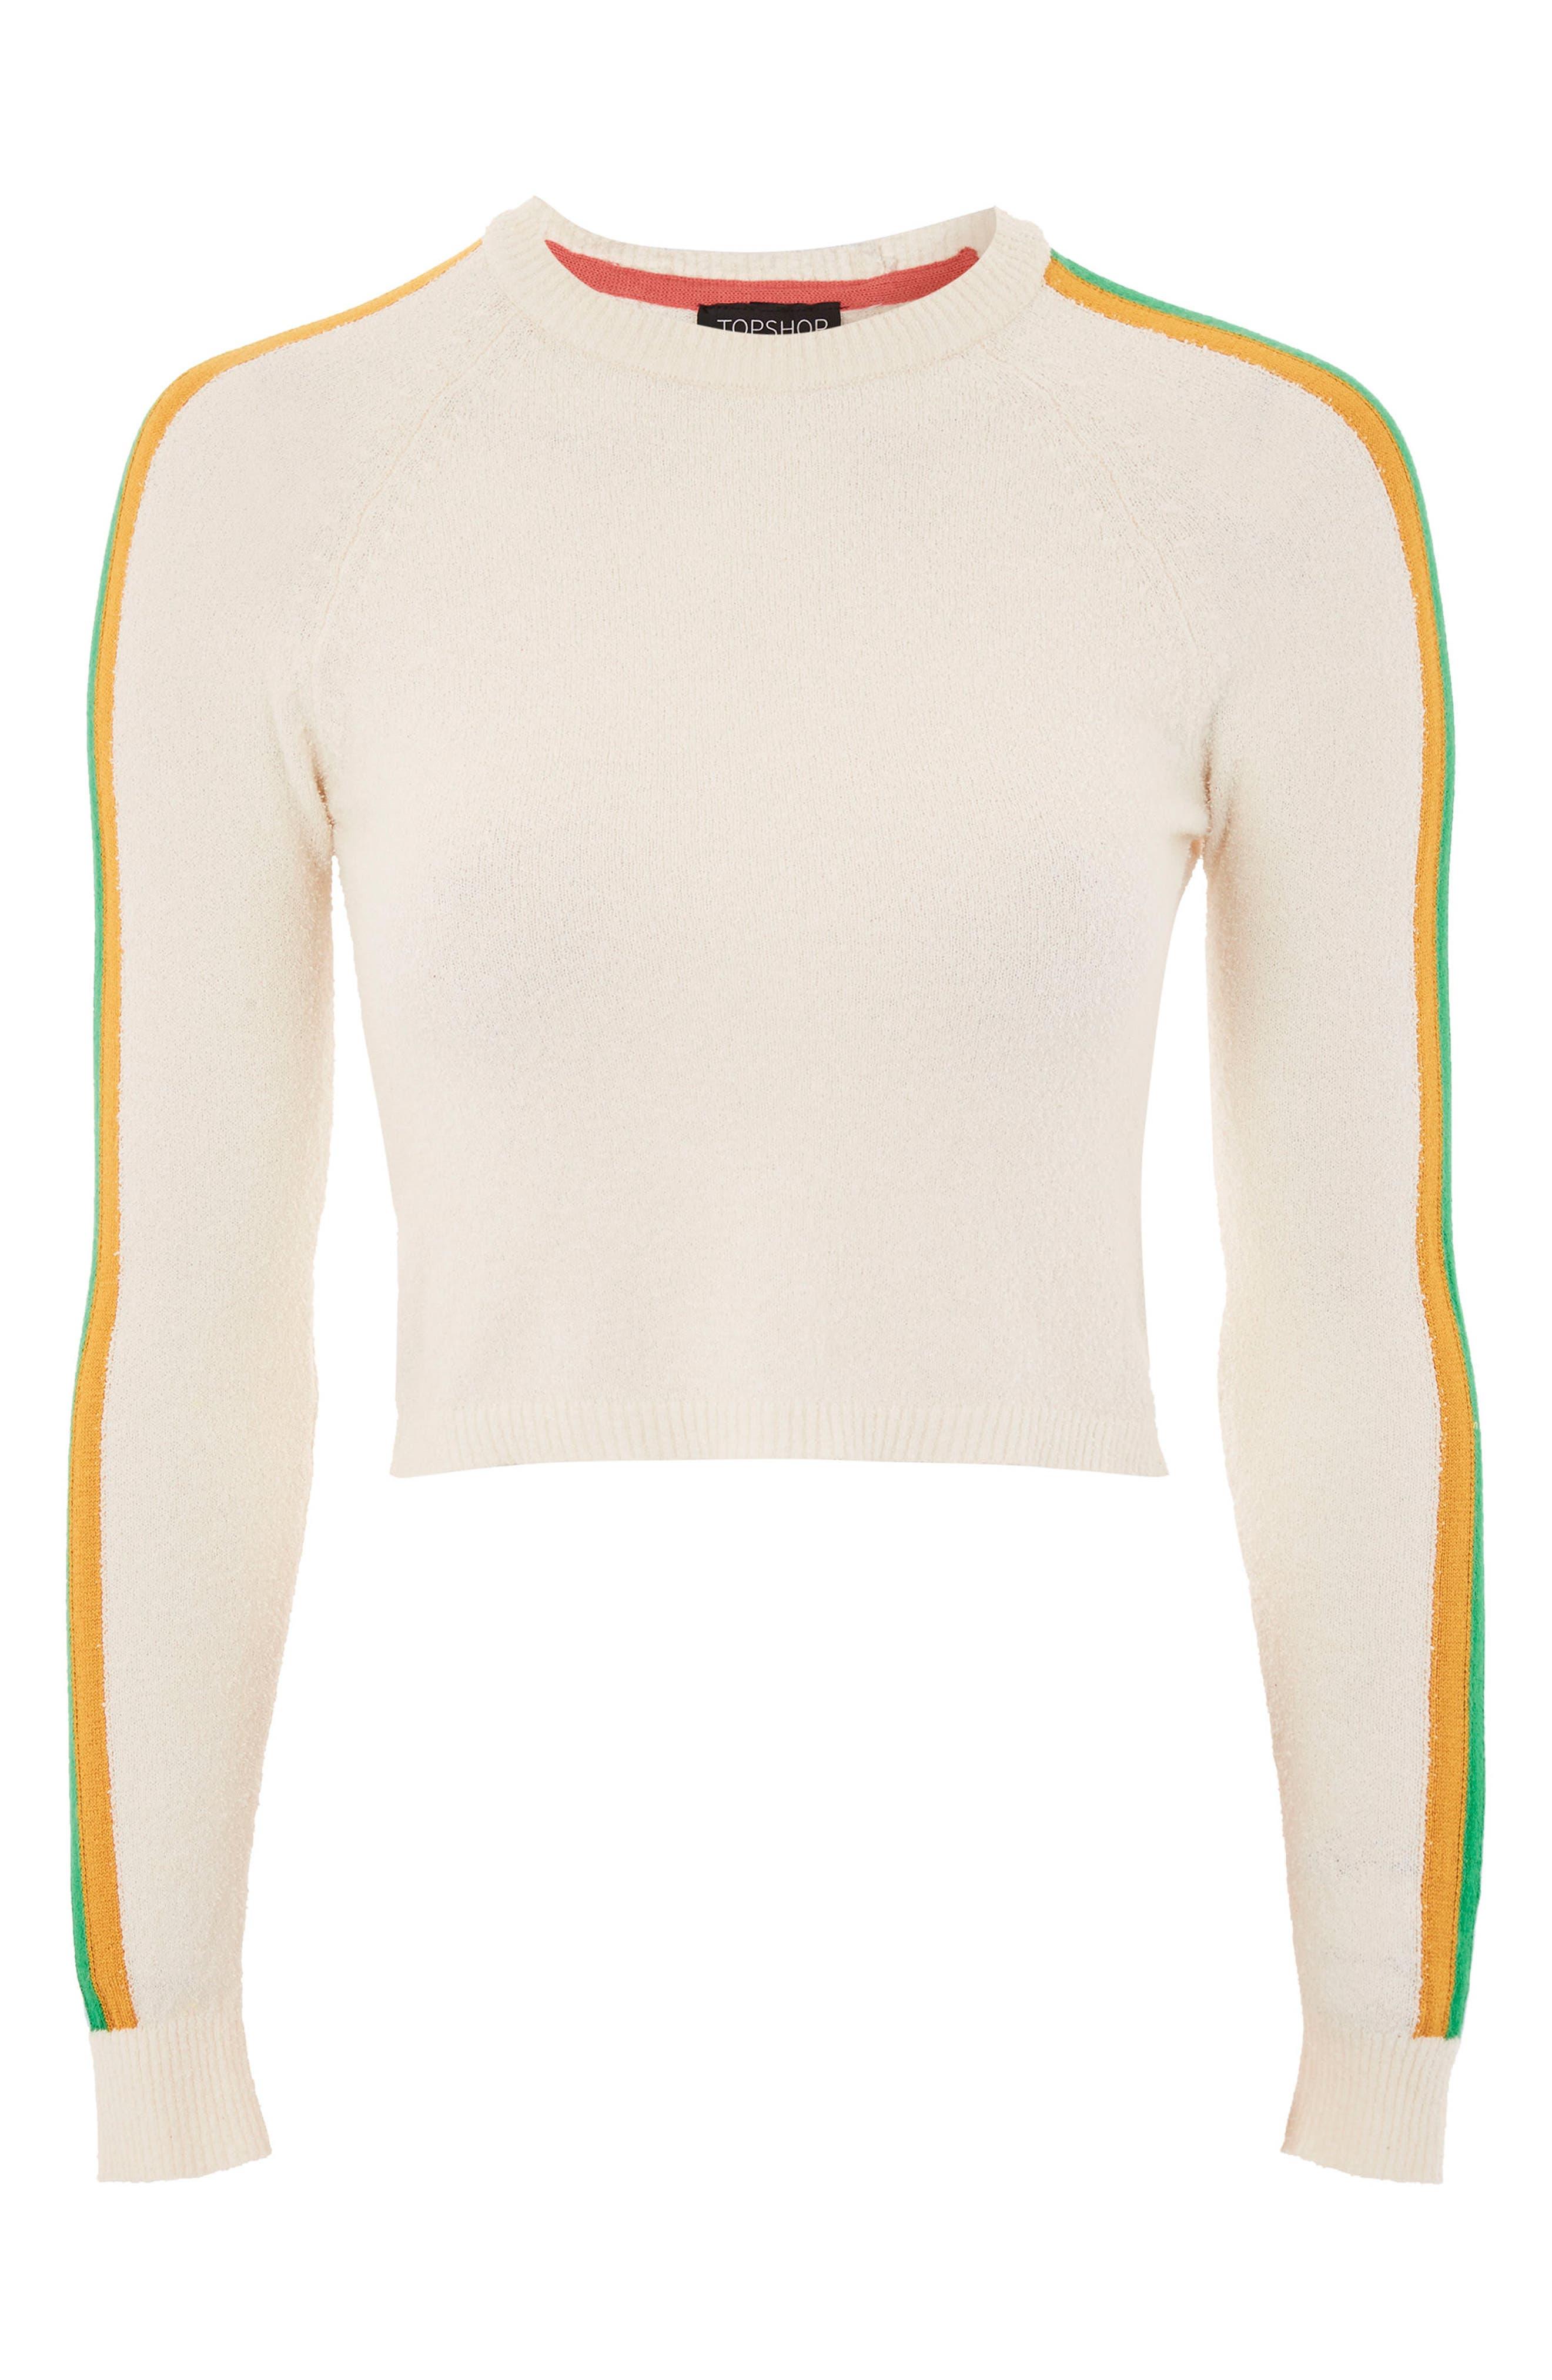 Rainbow Sleeve Knit Top,                             Alternate thumbnail 3, color,                             900